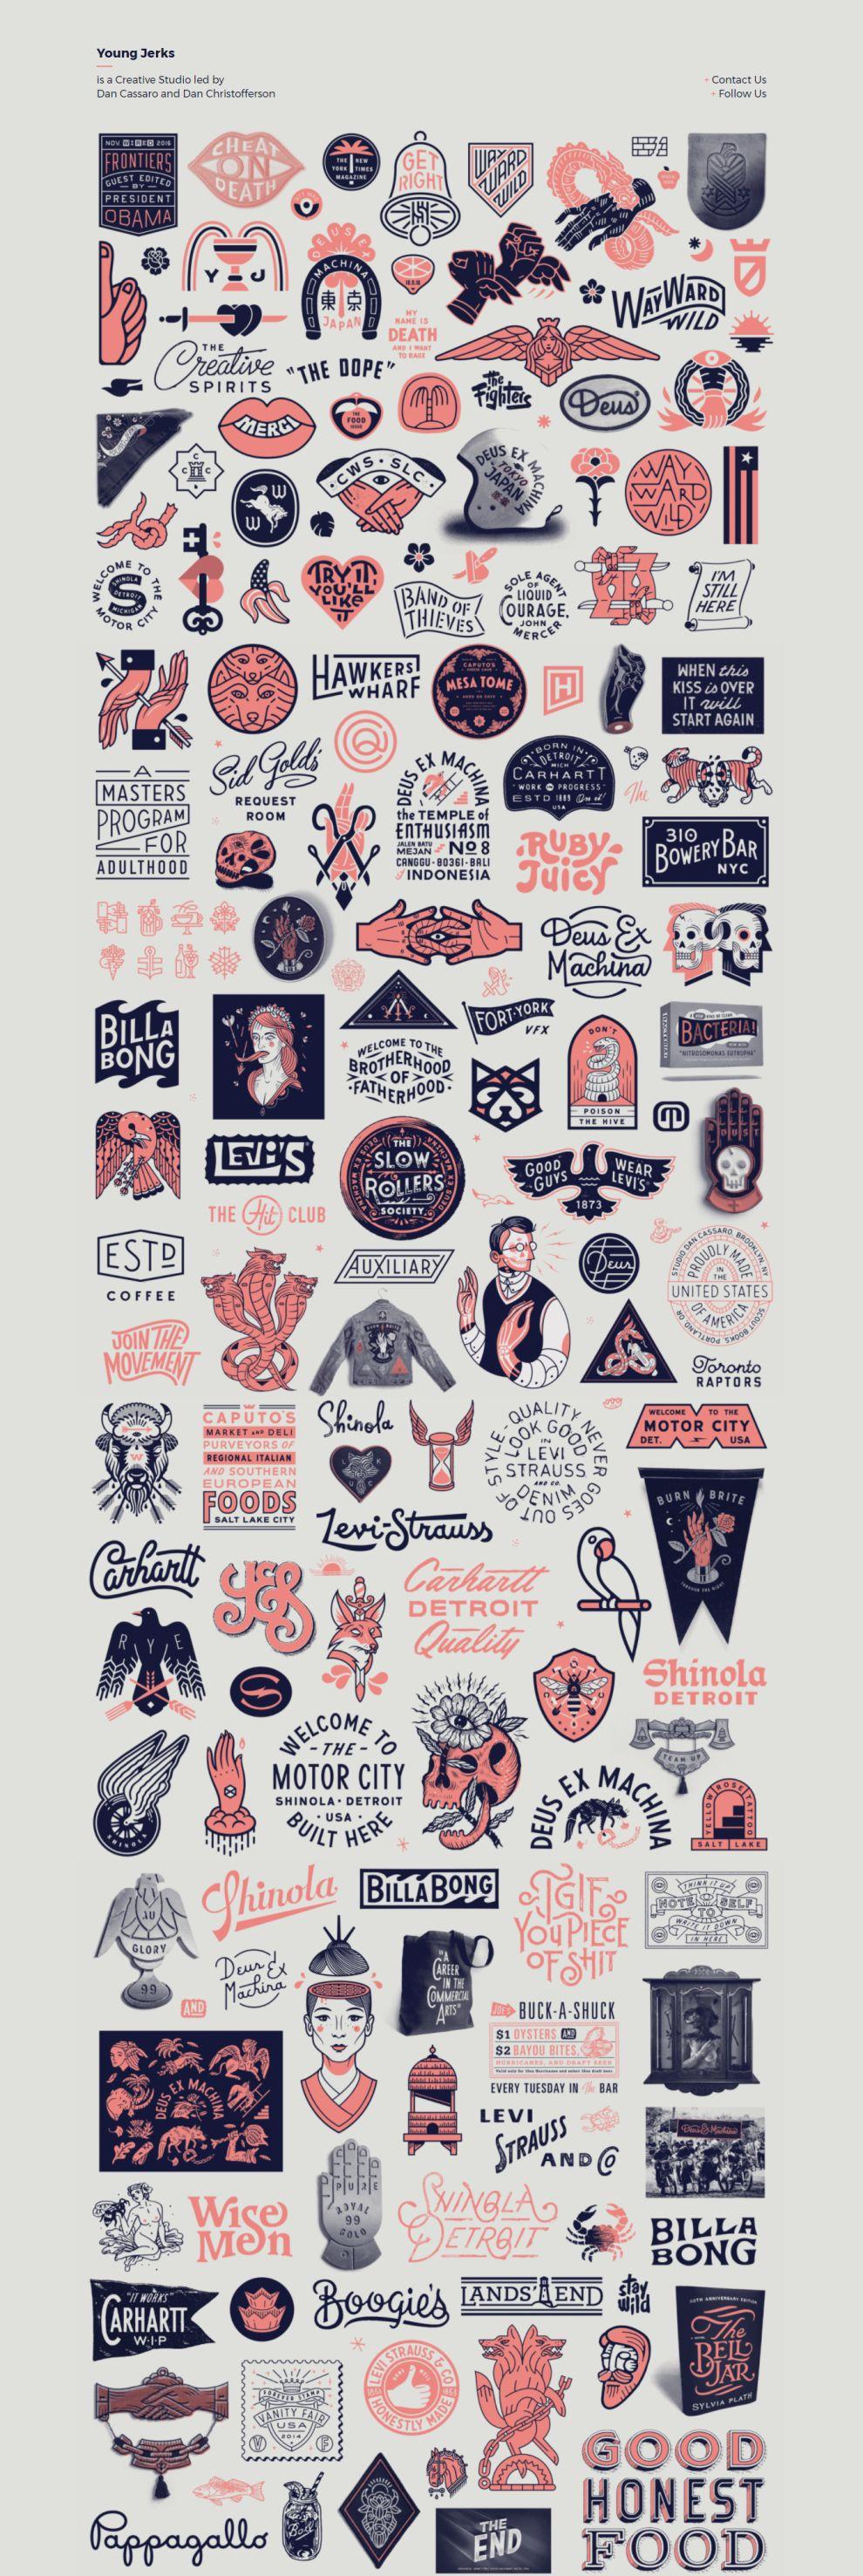 Young Jerks Minimal Website Design